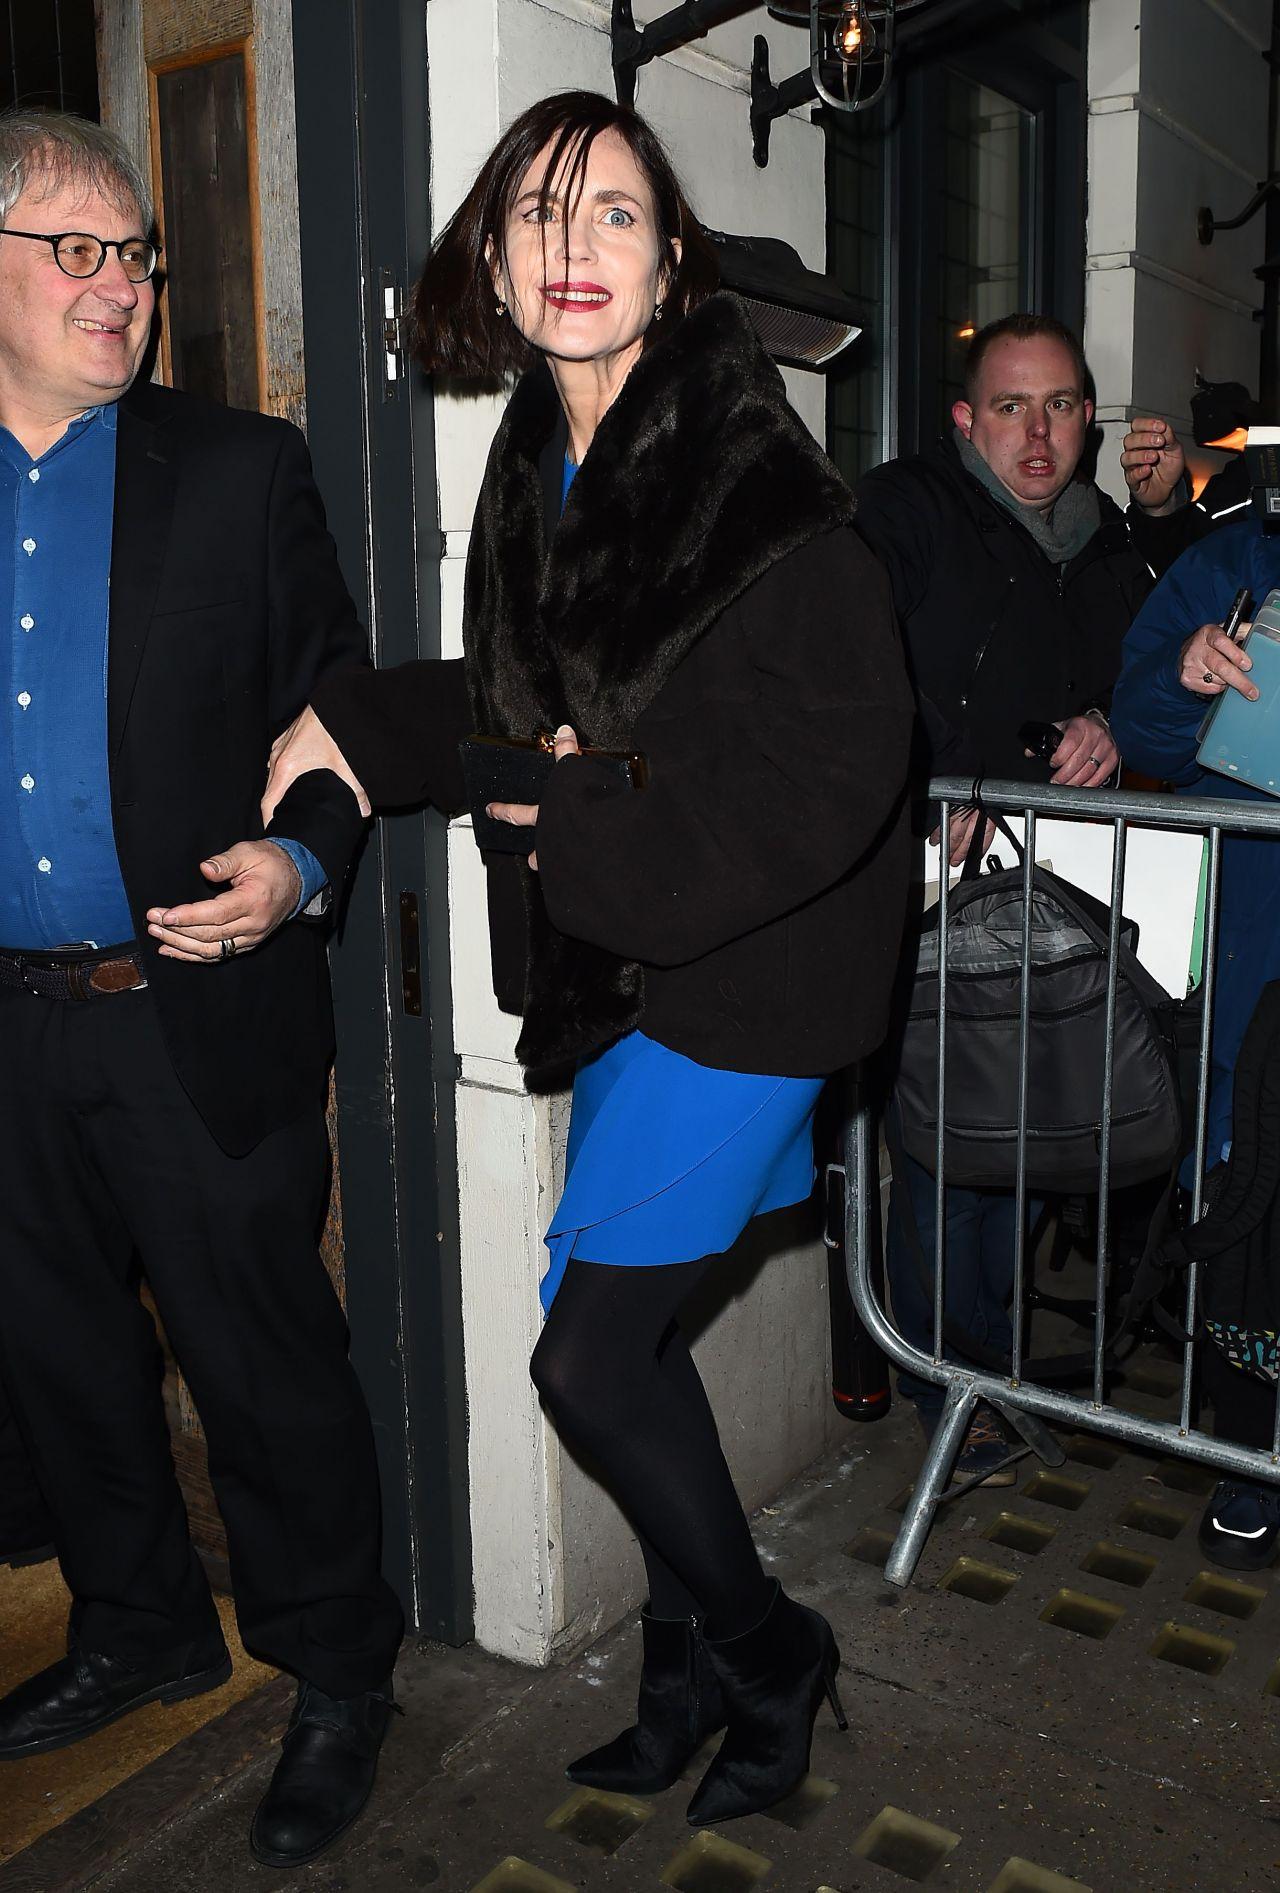 Elizabeth mcgovern arrives at harvey weinstein pre baftas dinner in london naked (76 images)